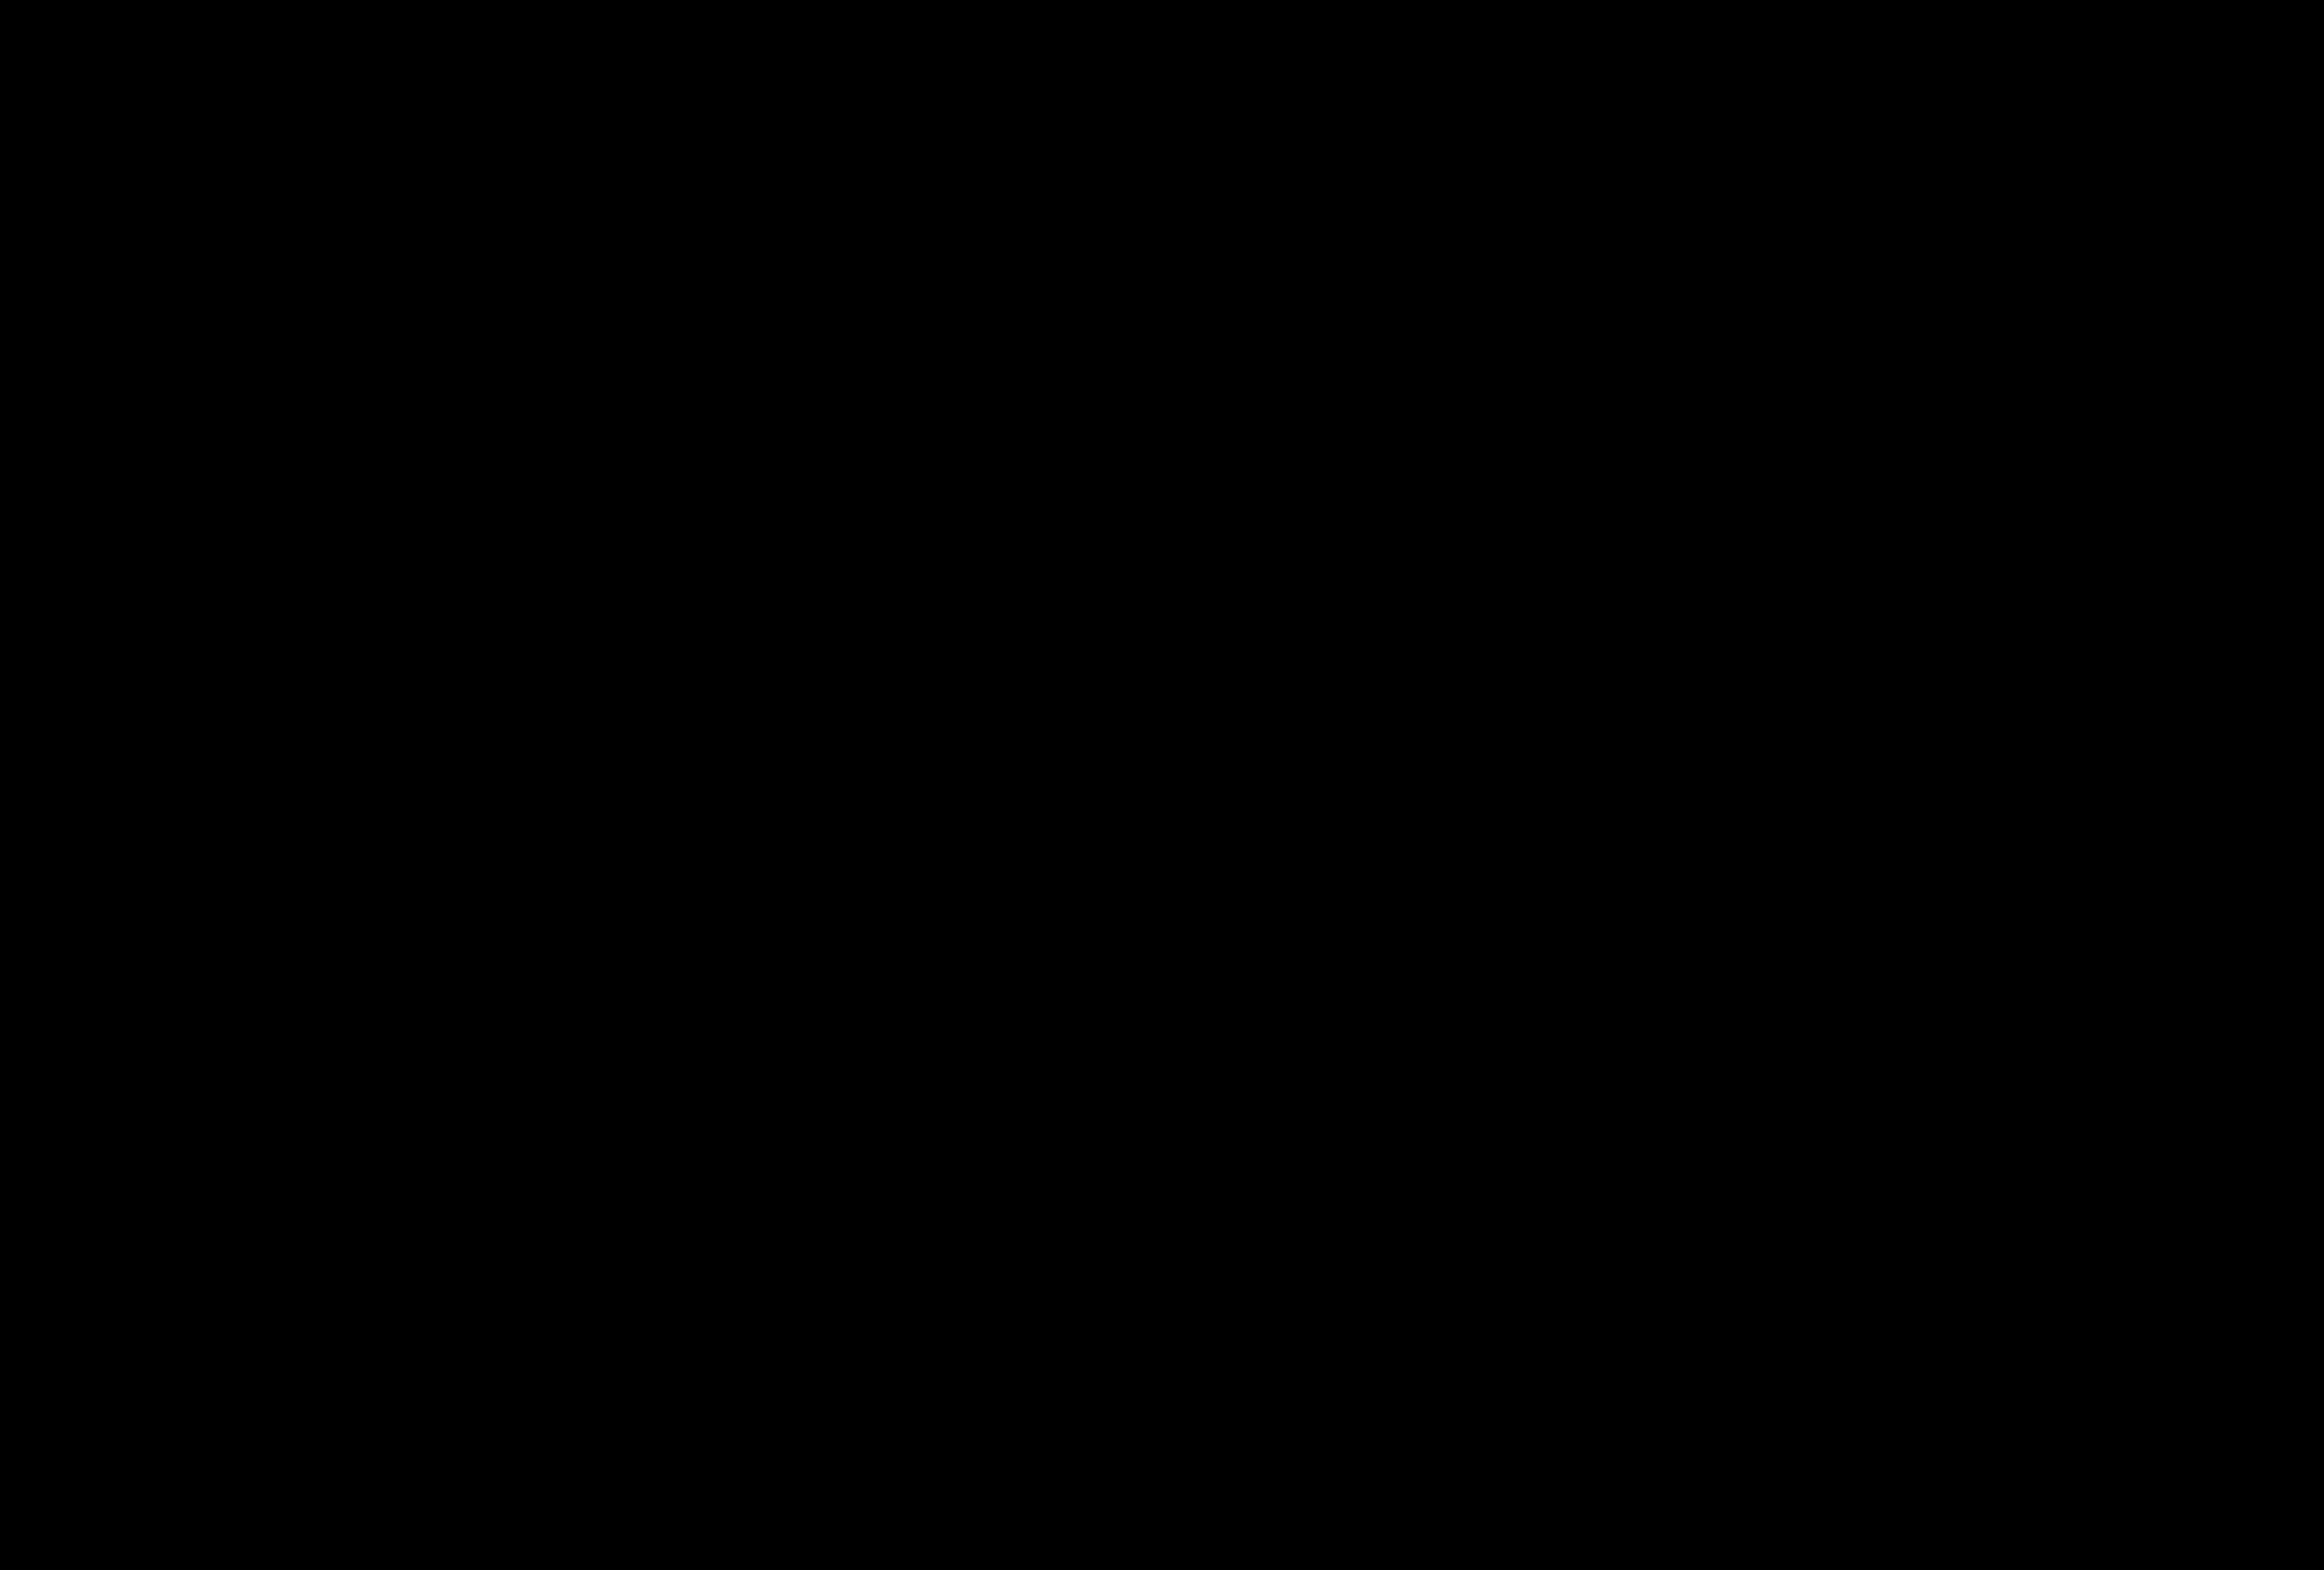 Minimalist Monitor And Computer